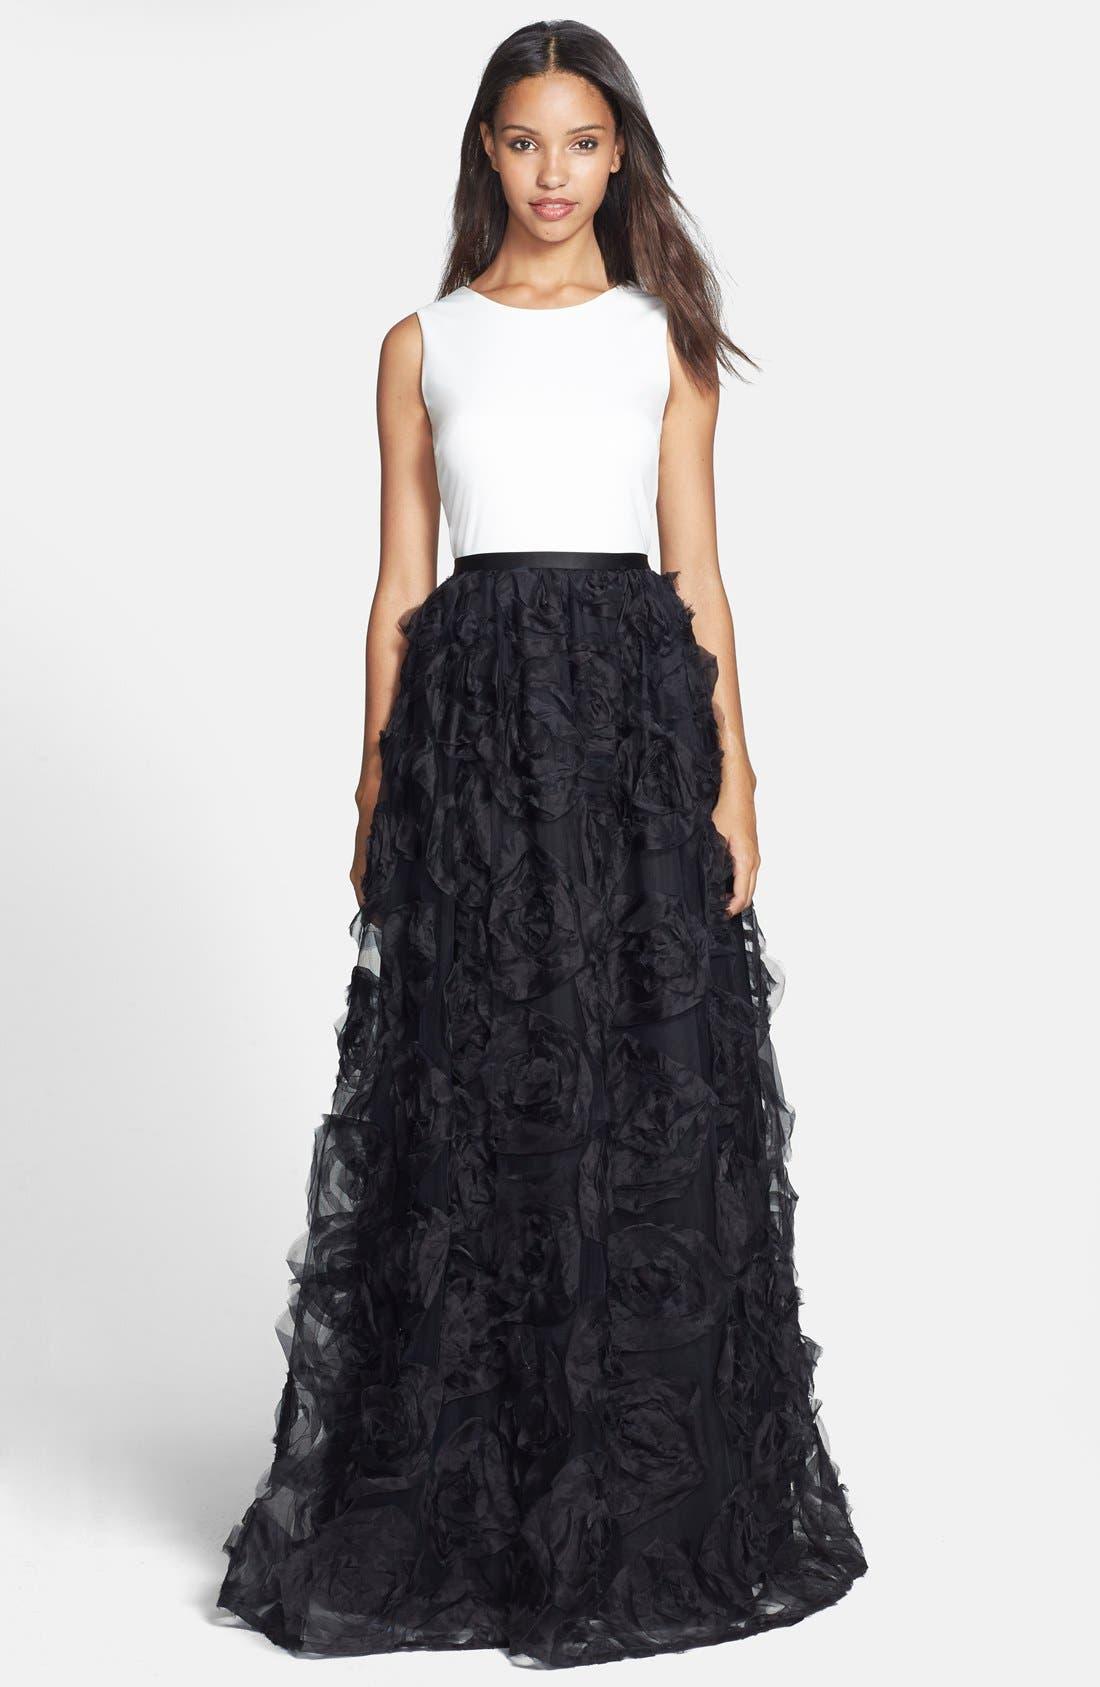 Alternate Image 1 Selected - Aidan Mattox Sleeveless Ruffle Skirt Ballgown